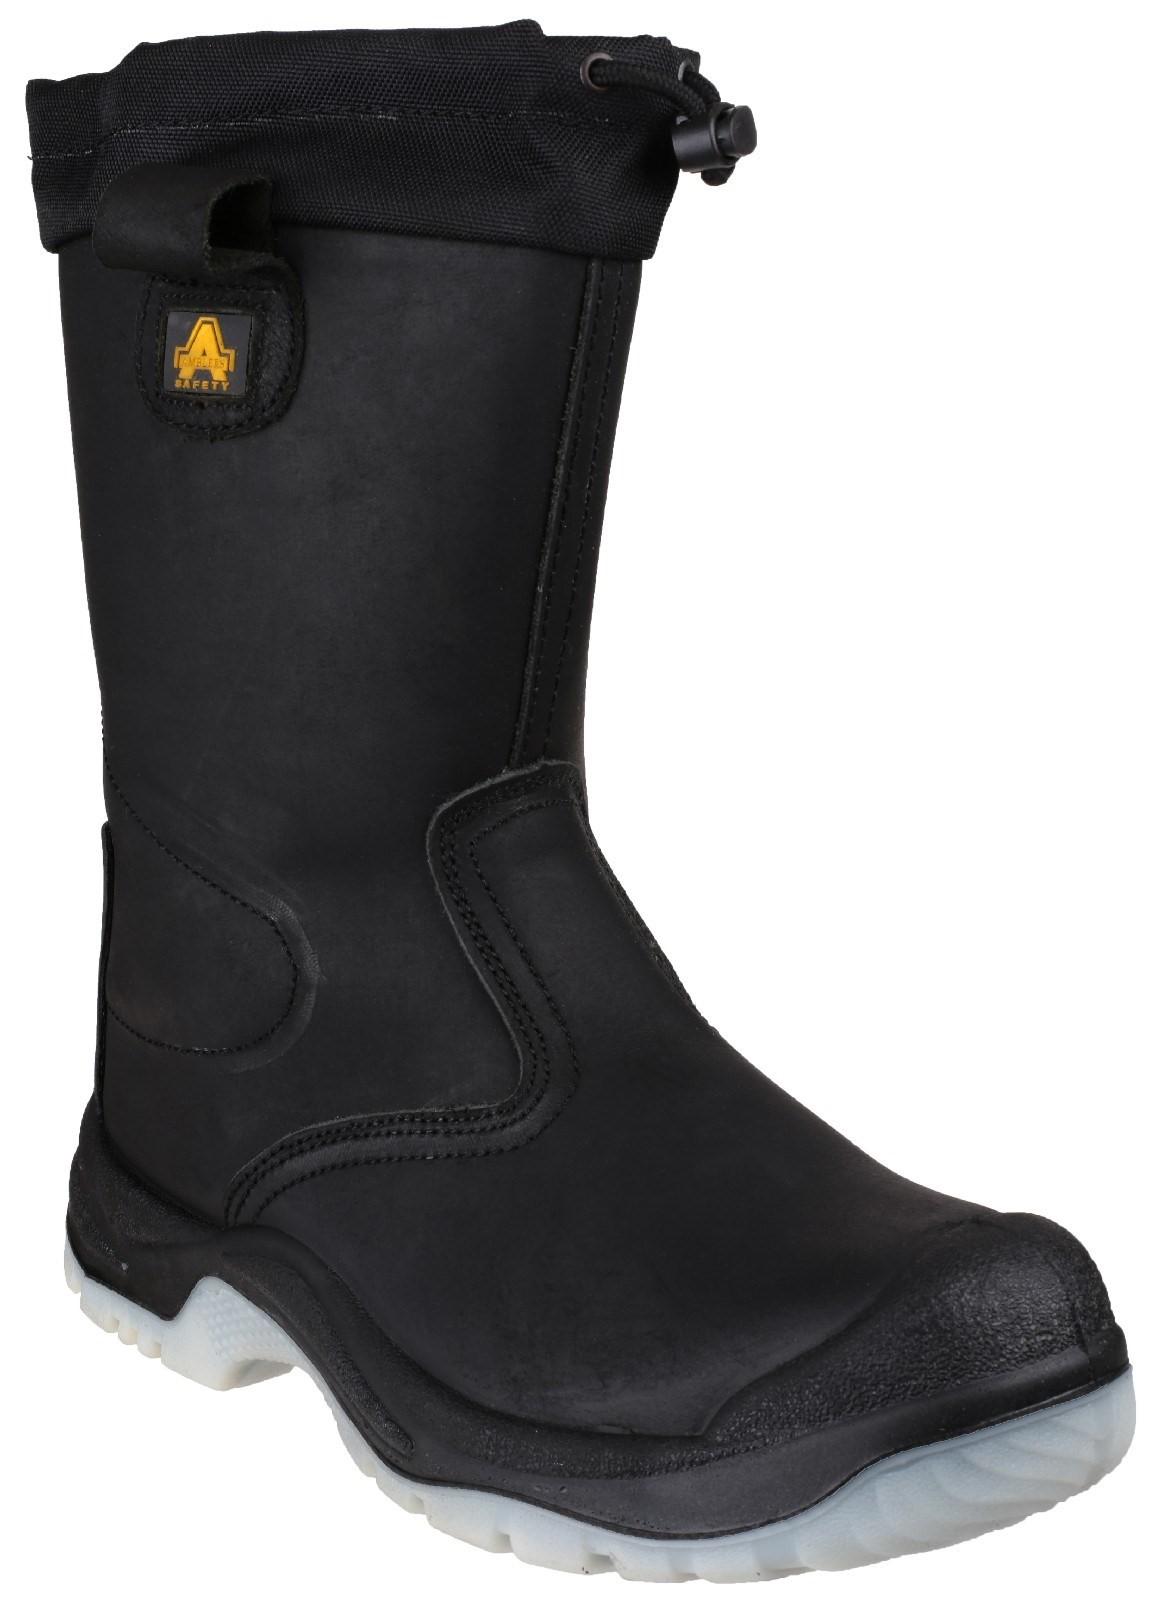 f42b7f14481 Amblers FS209 Safety Rigger Boot